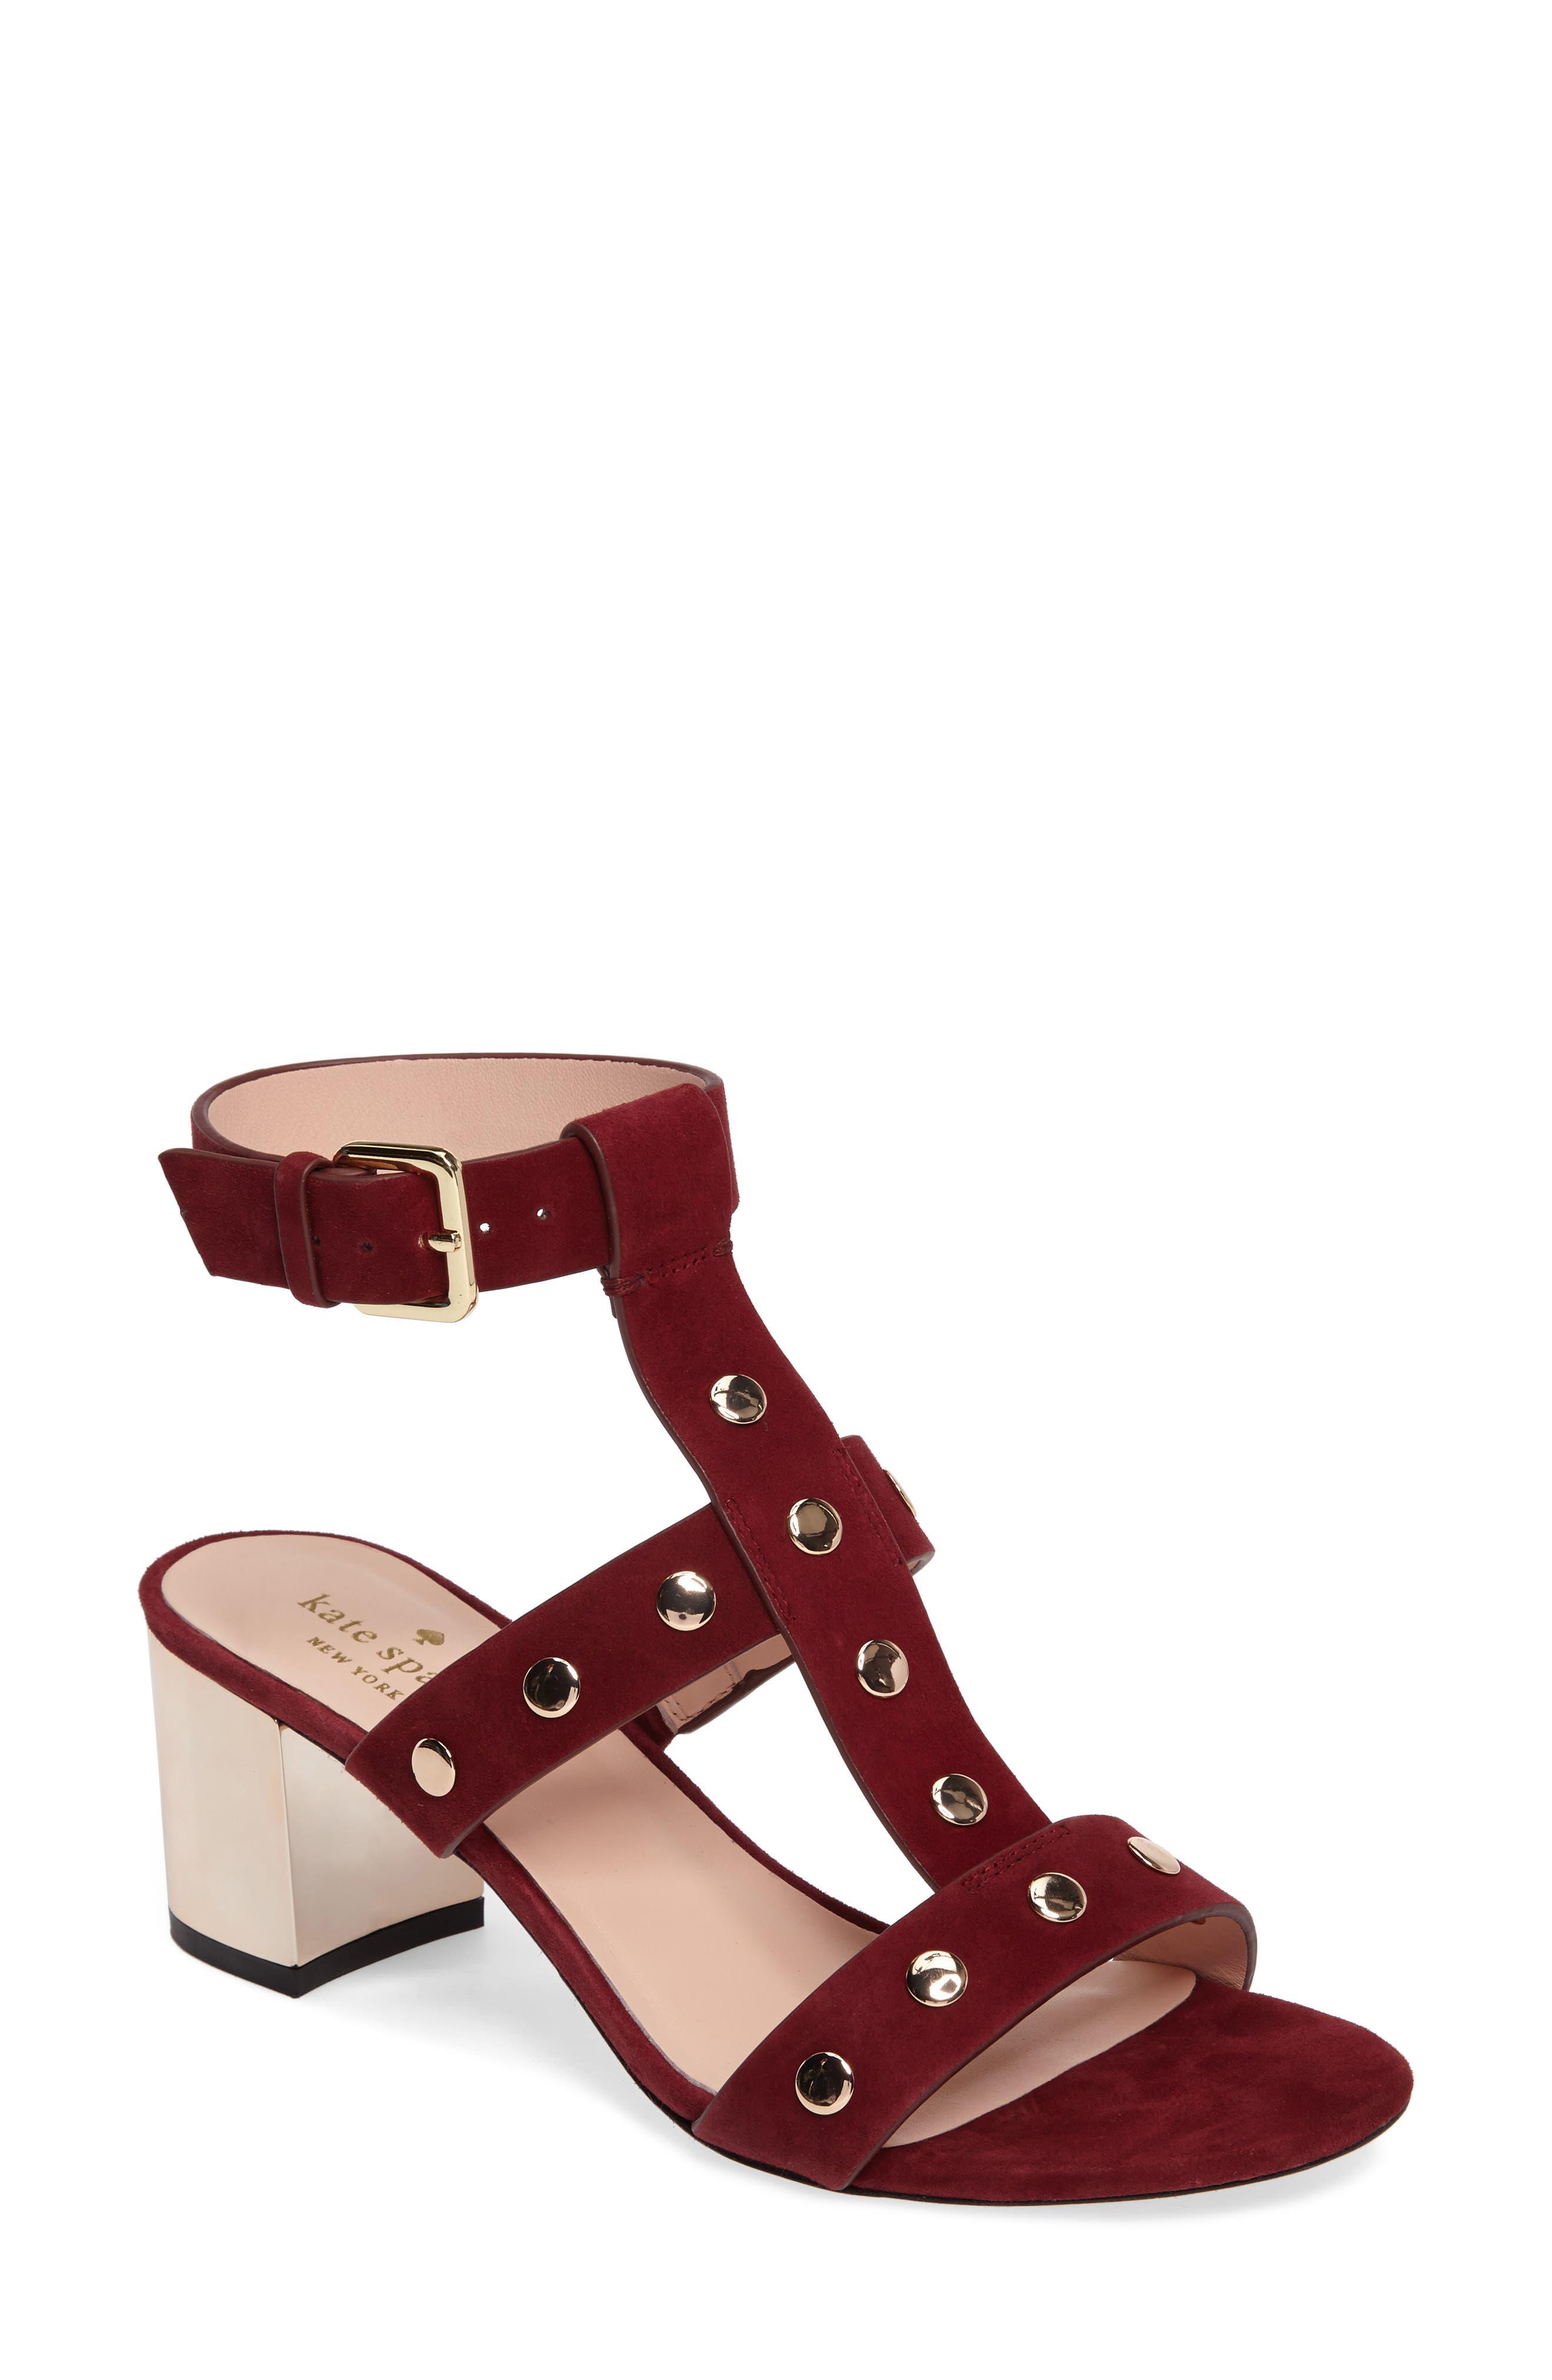 Main Image - kate spade new york welby t-strap sandal (Women)